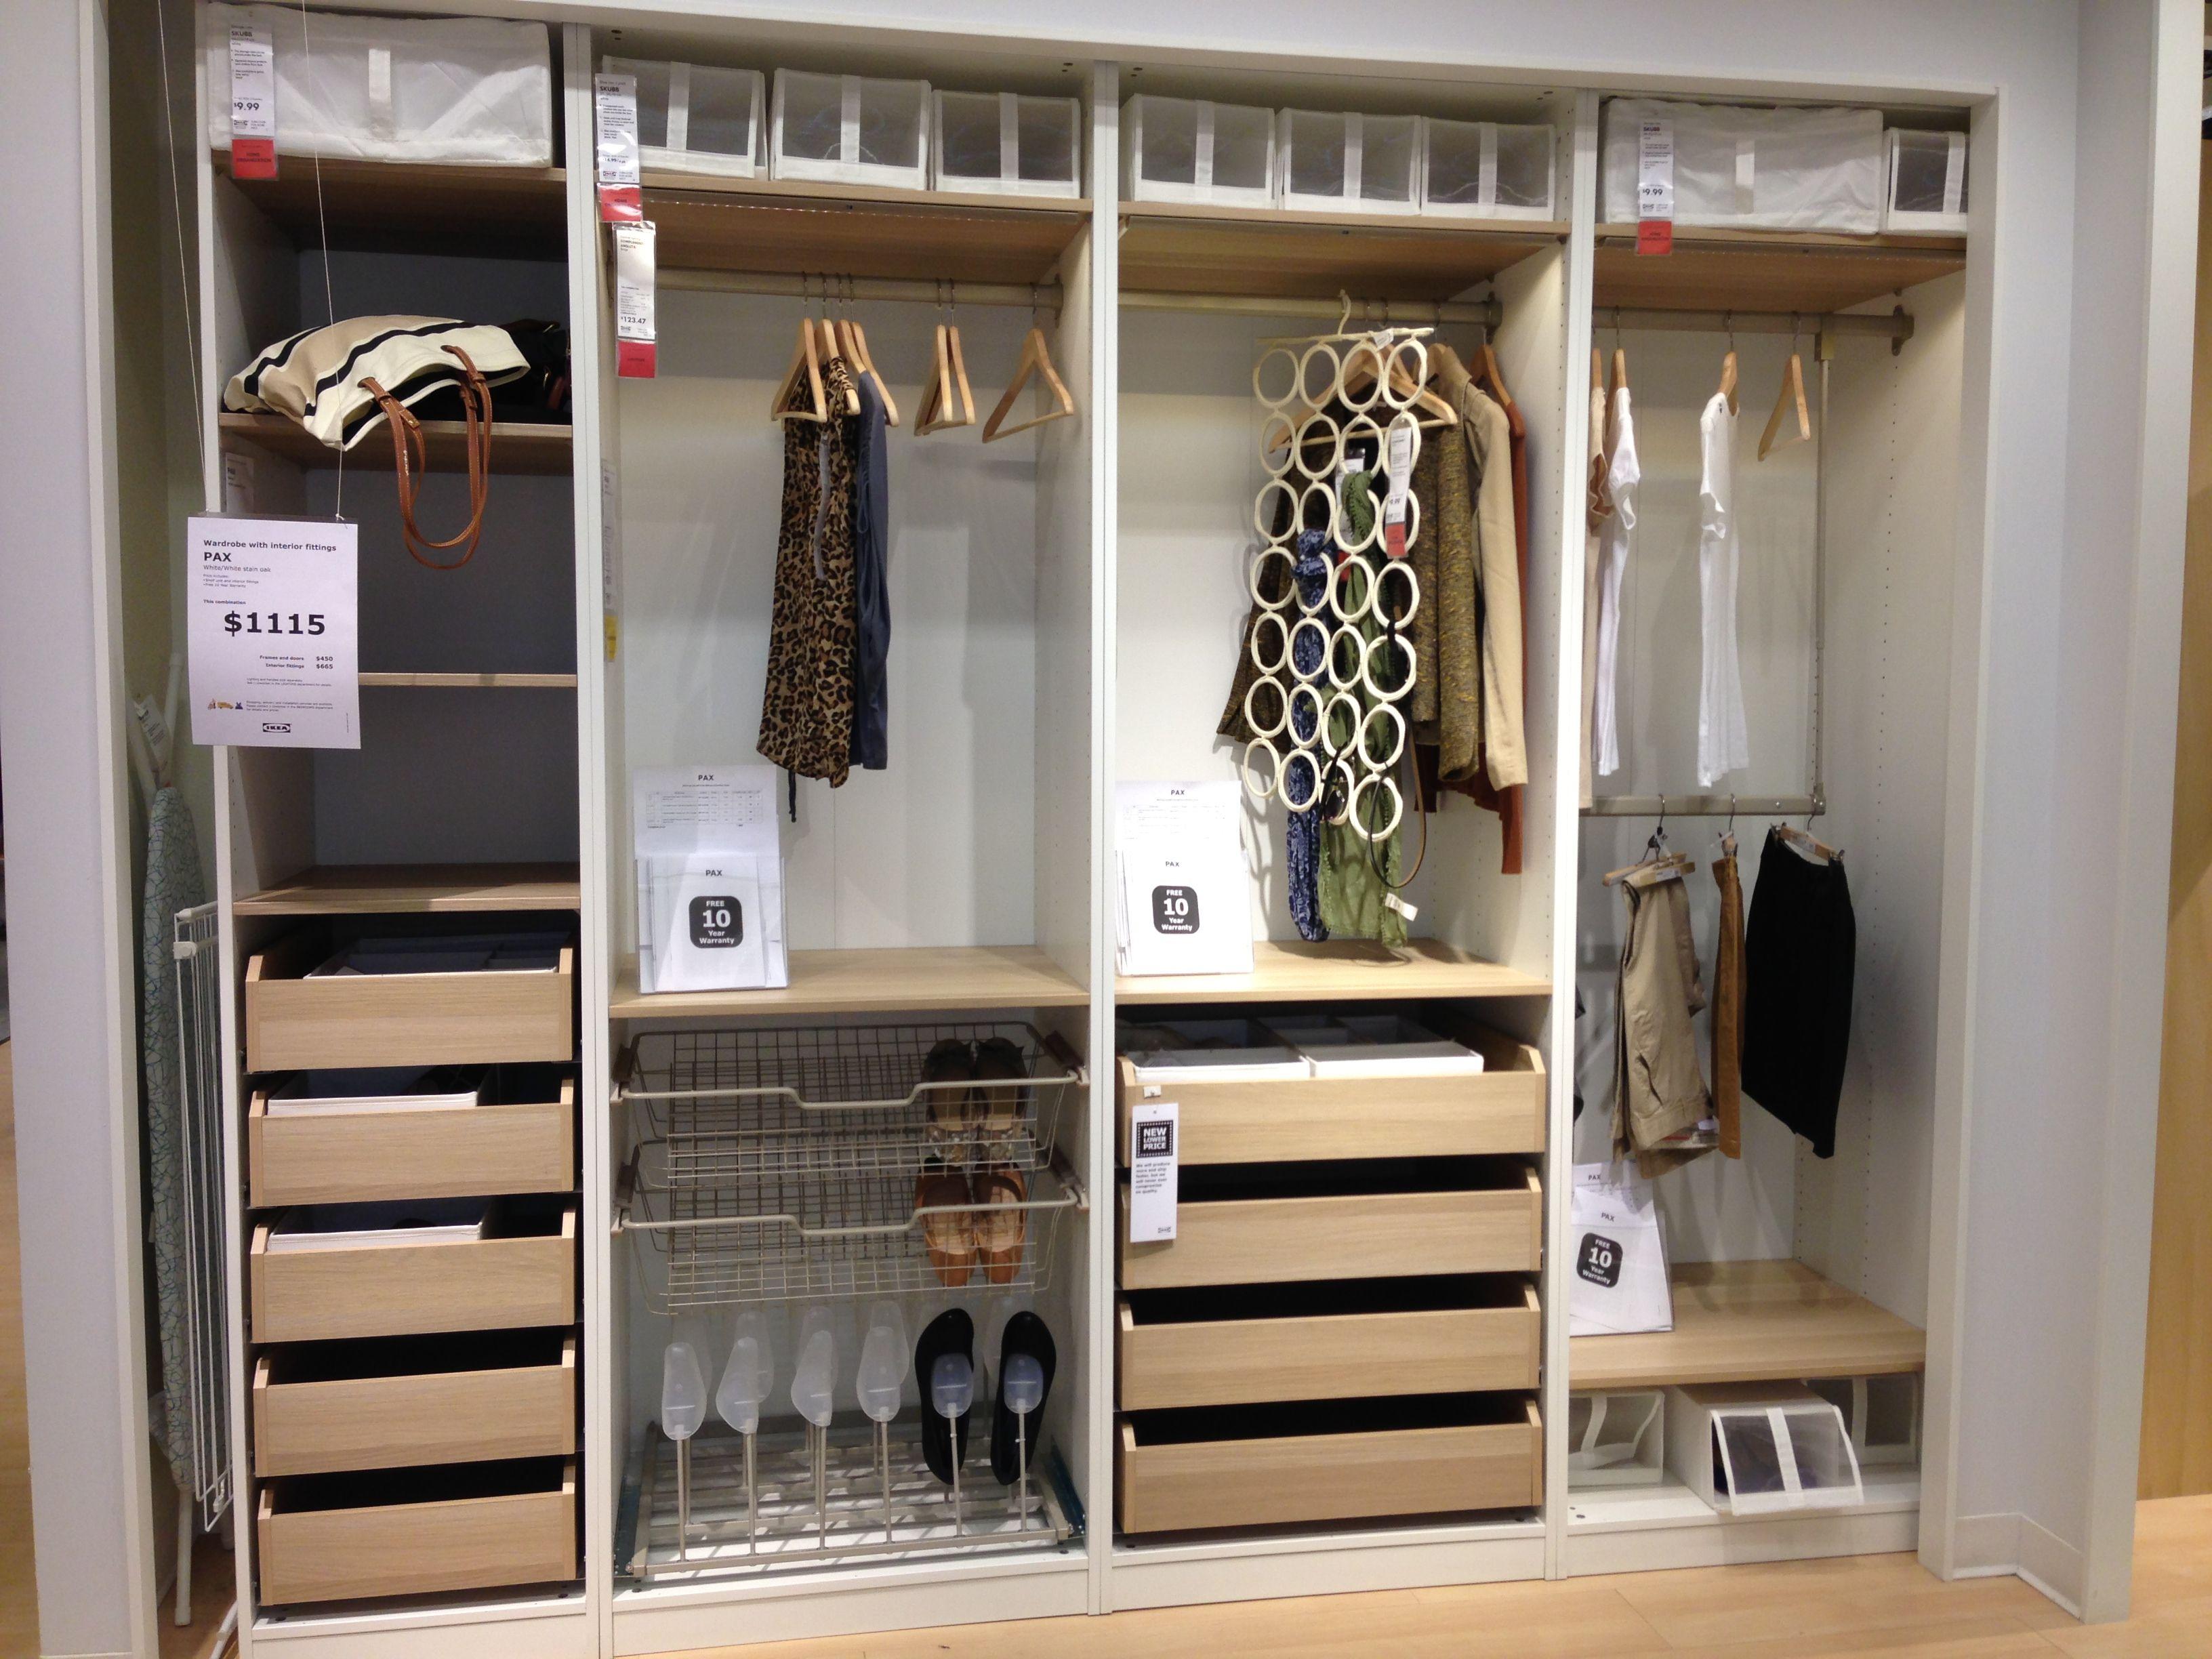 ikea drawers for pax wardrobe. Black Bedroom Furniture Sets. Home Design Ideas